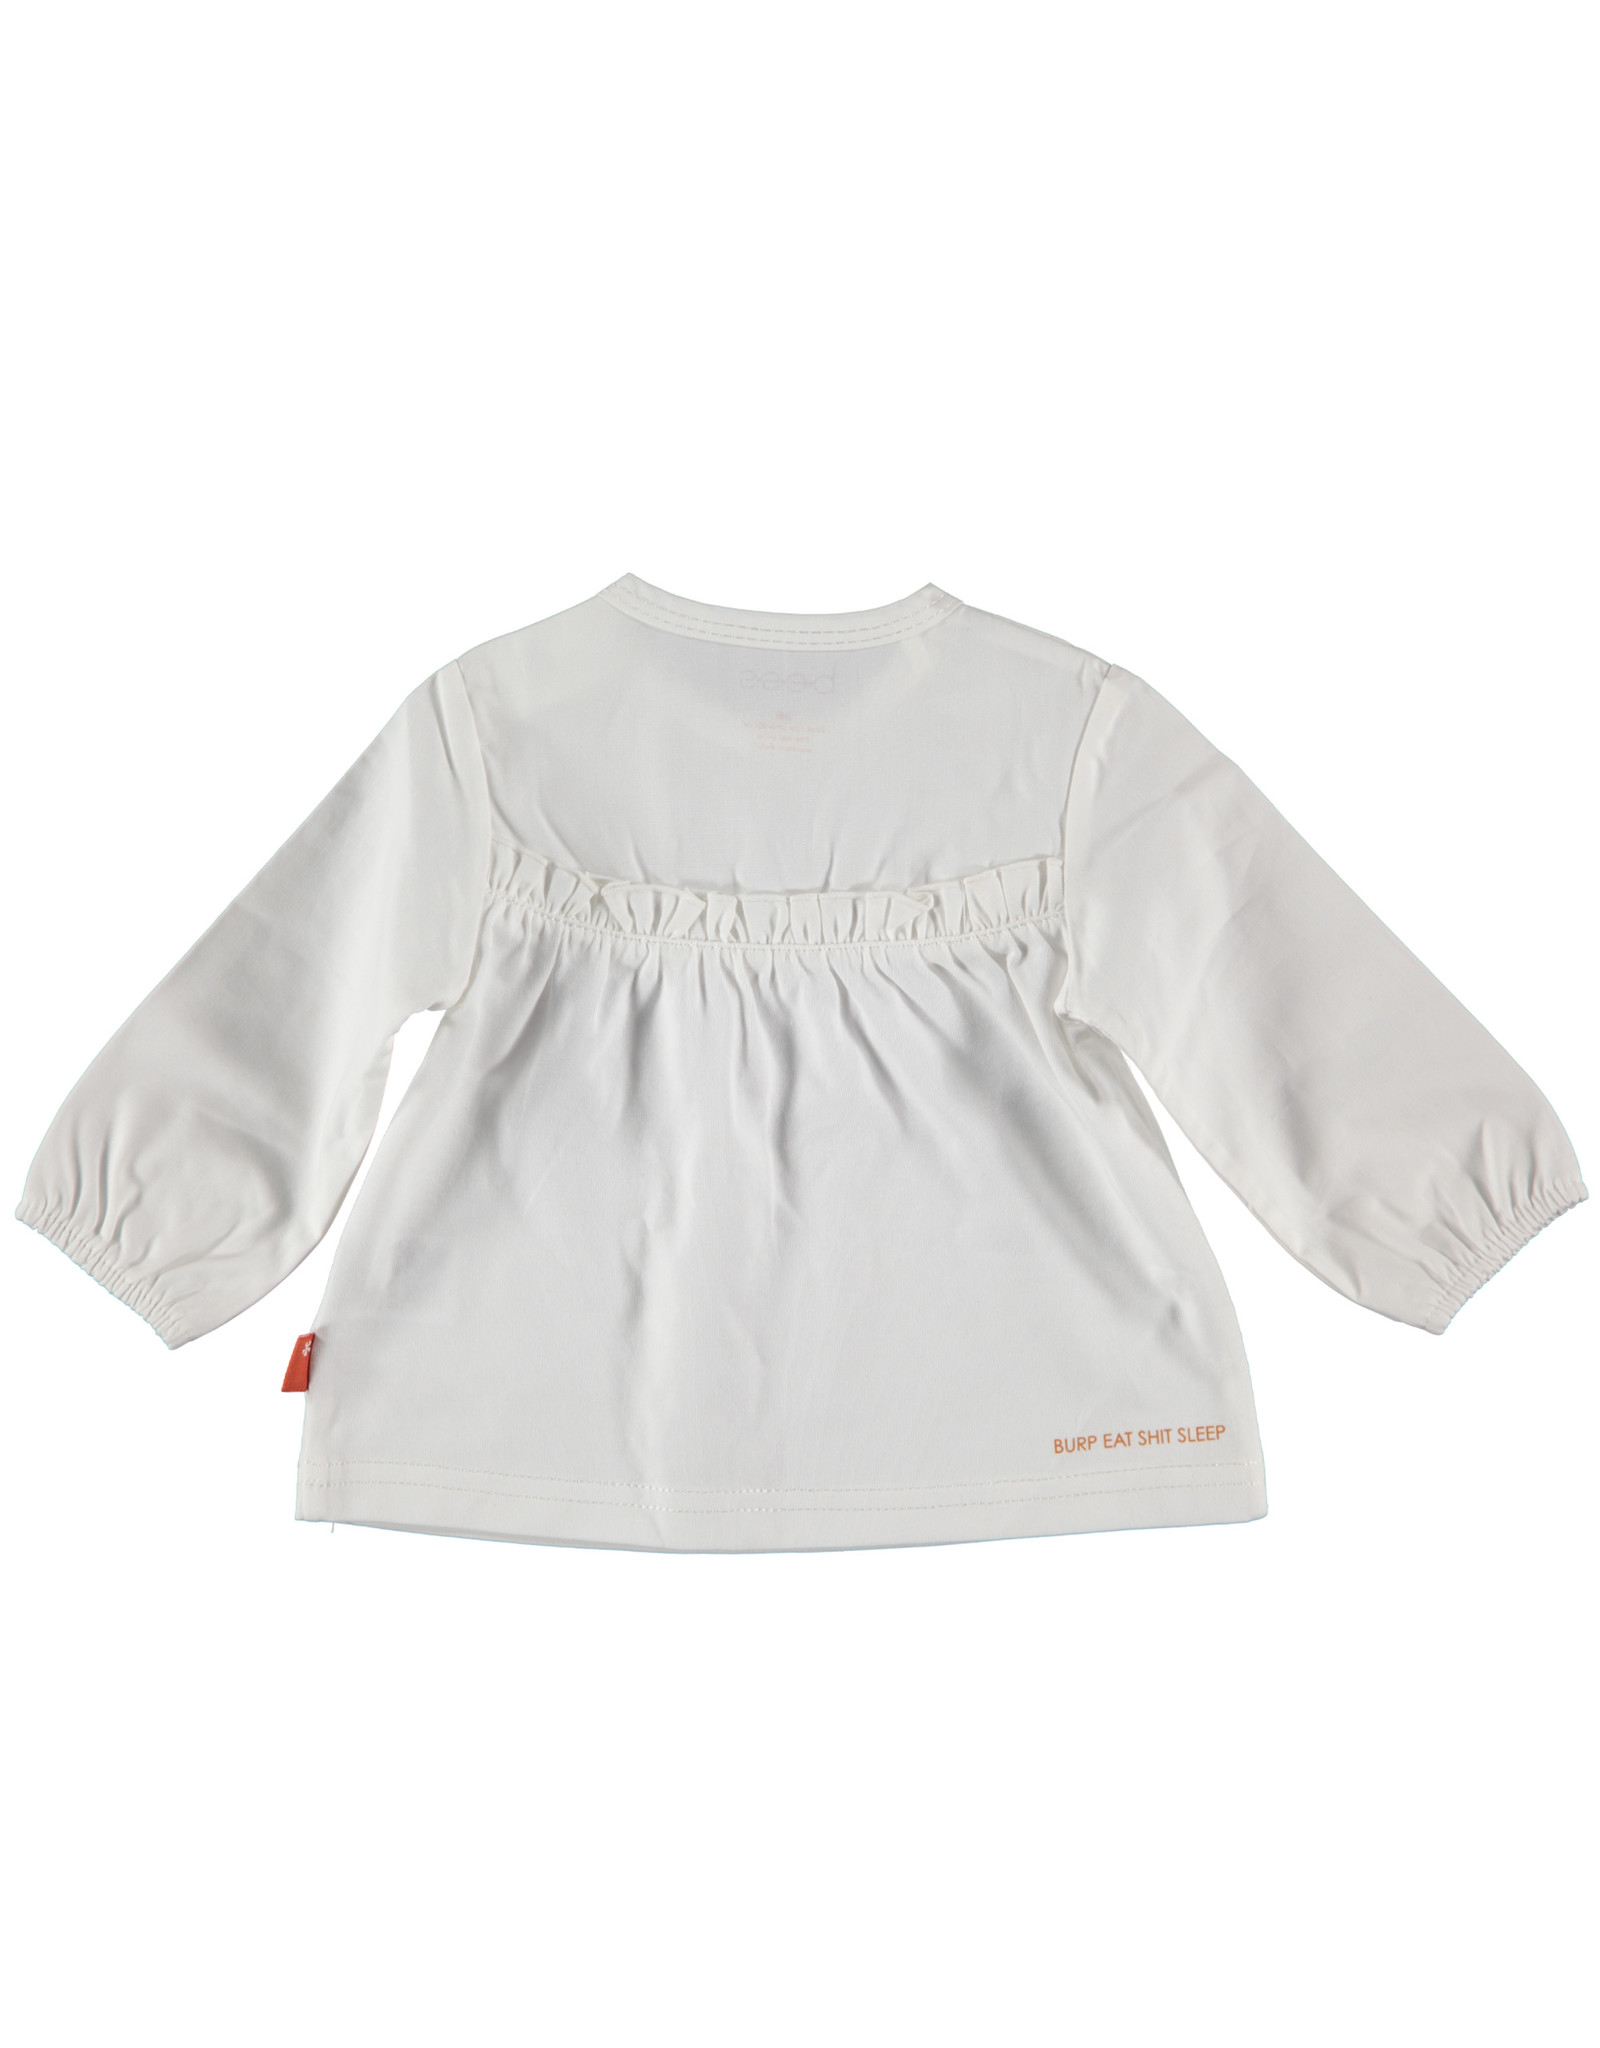 B.E.S.S. Shirt Blouse Ruffles, White